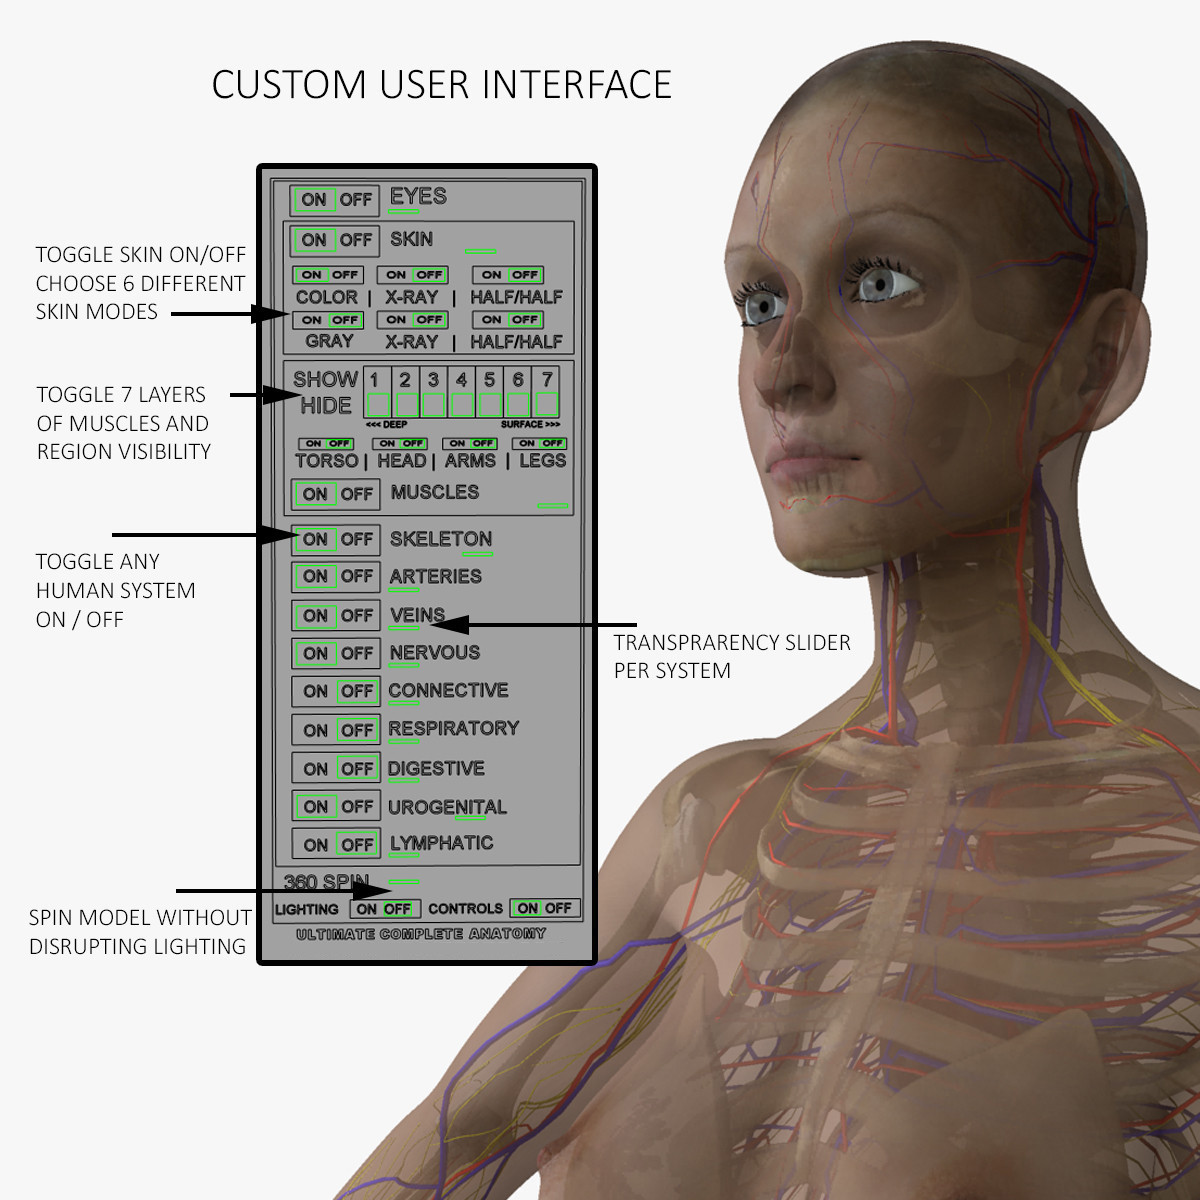 Facial Surface Anatomy Images - human body anatomy